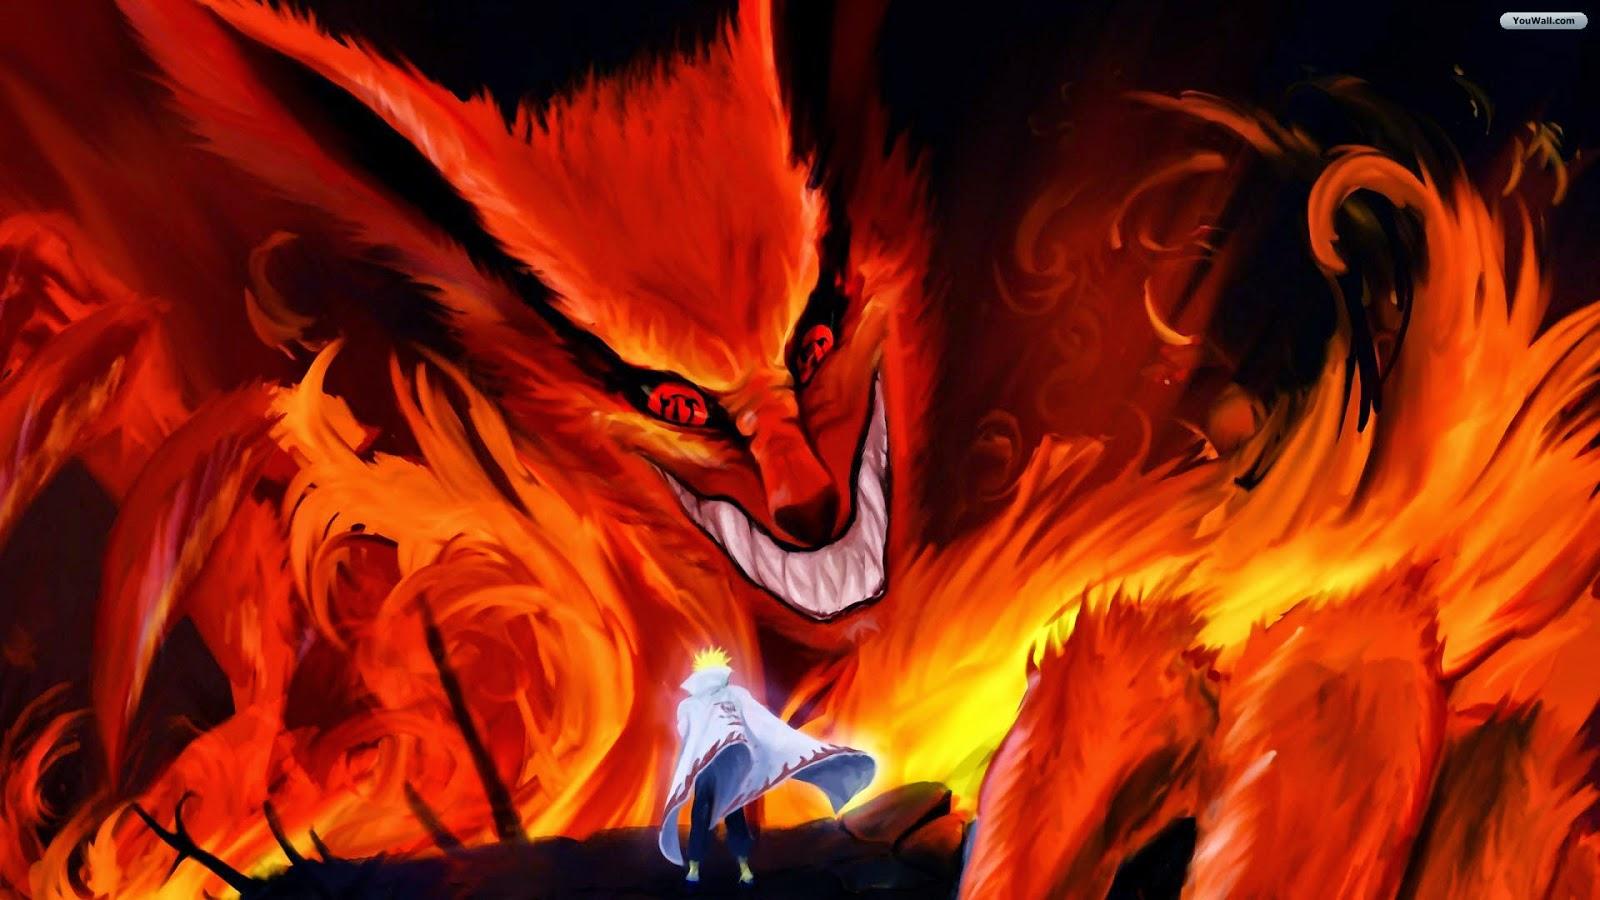 KURAMA - KYUUBI BIJUU | Naruto Imagens e Wallpapers Gaara As A Wolf